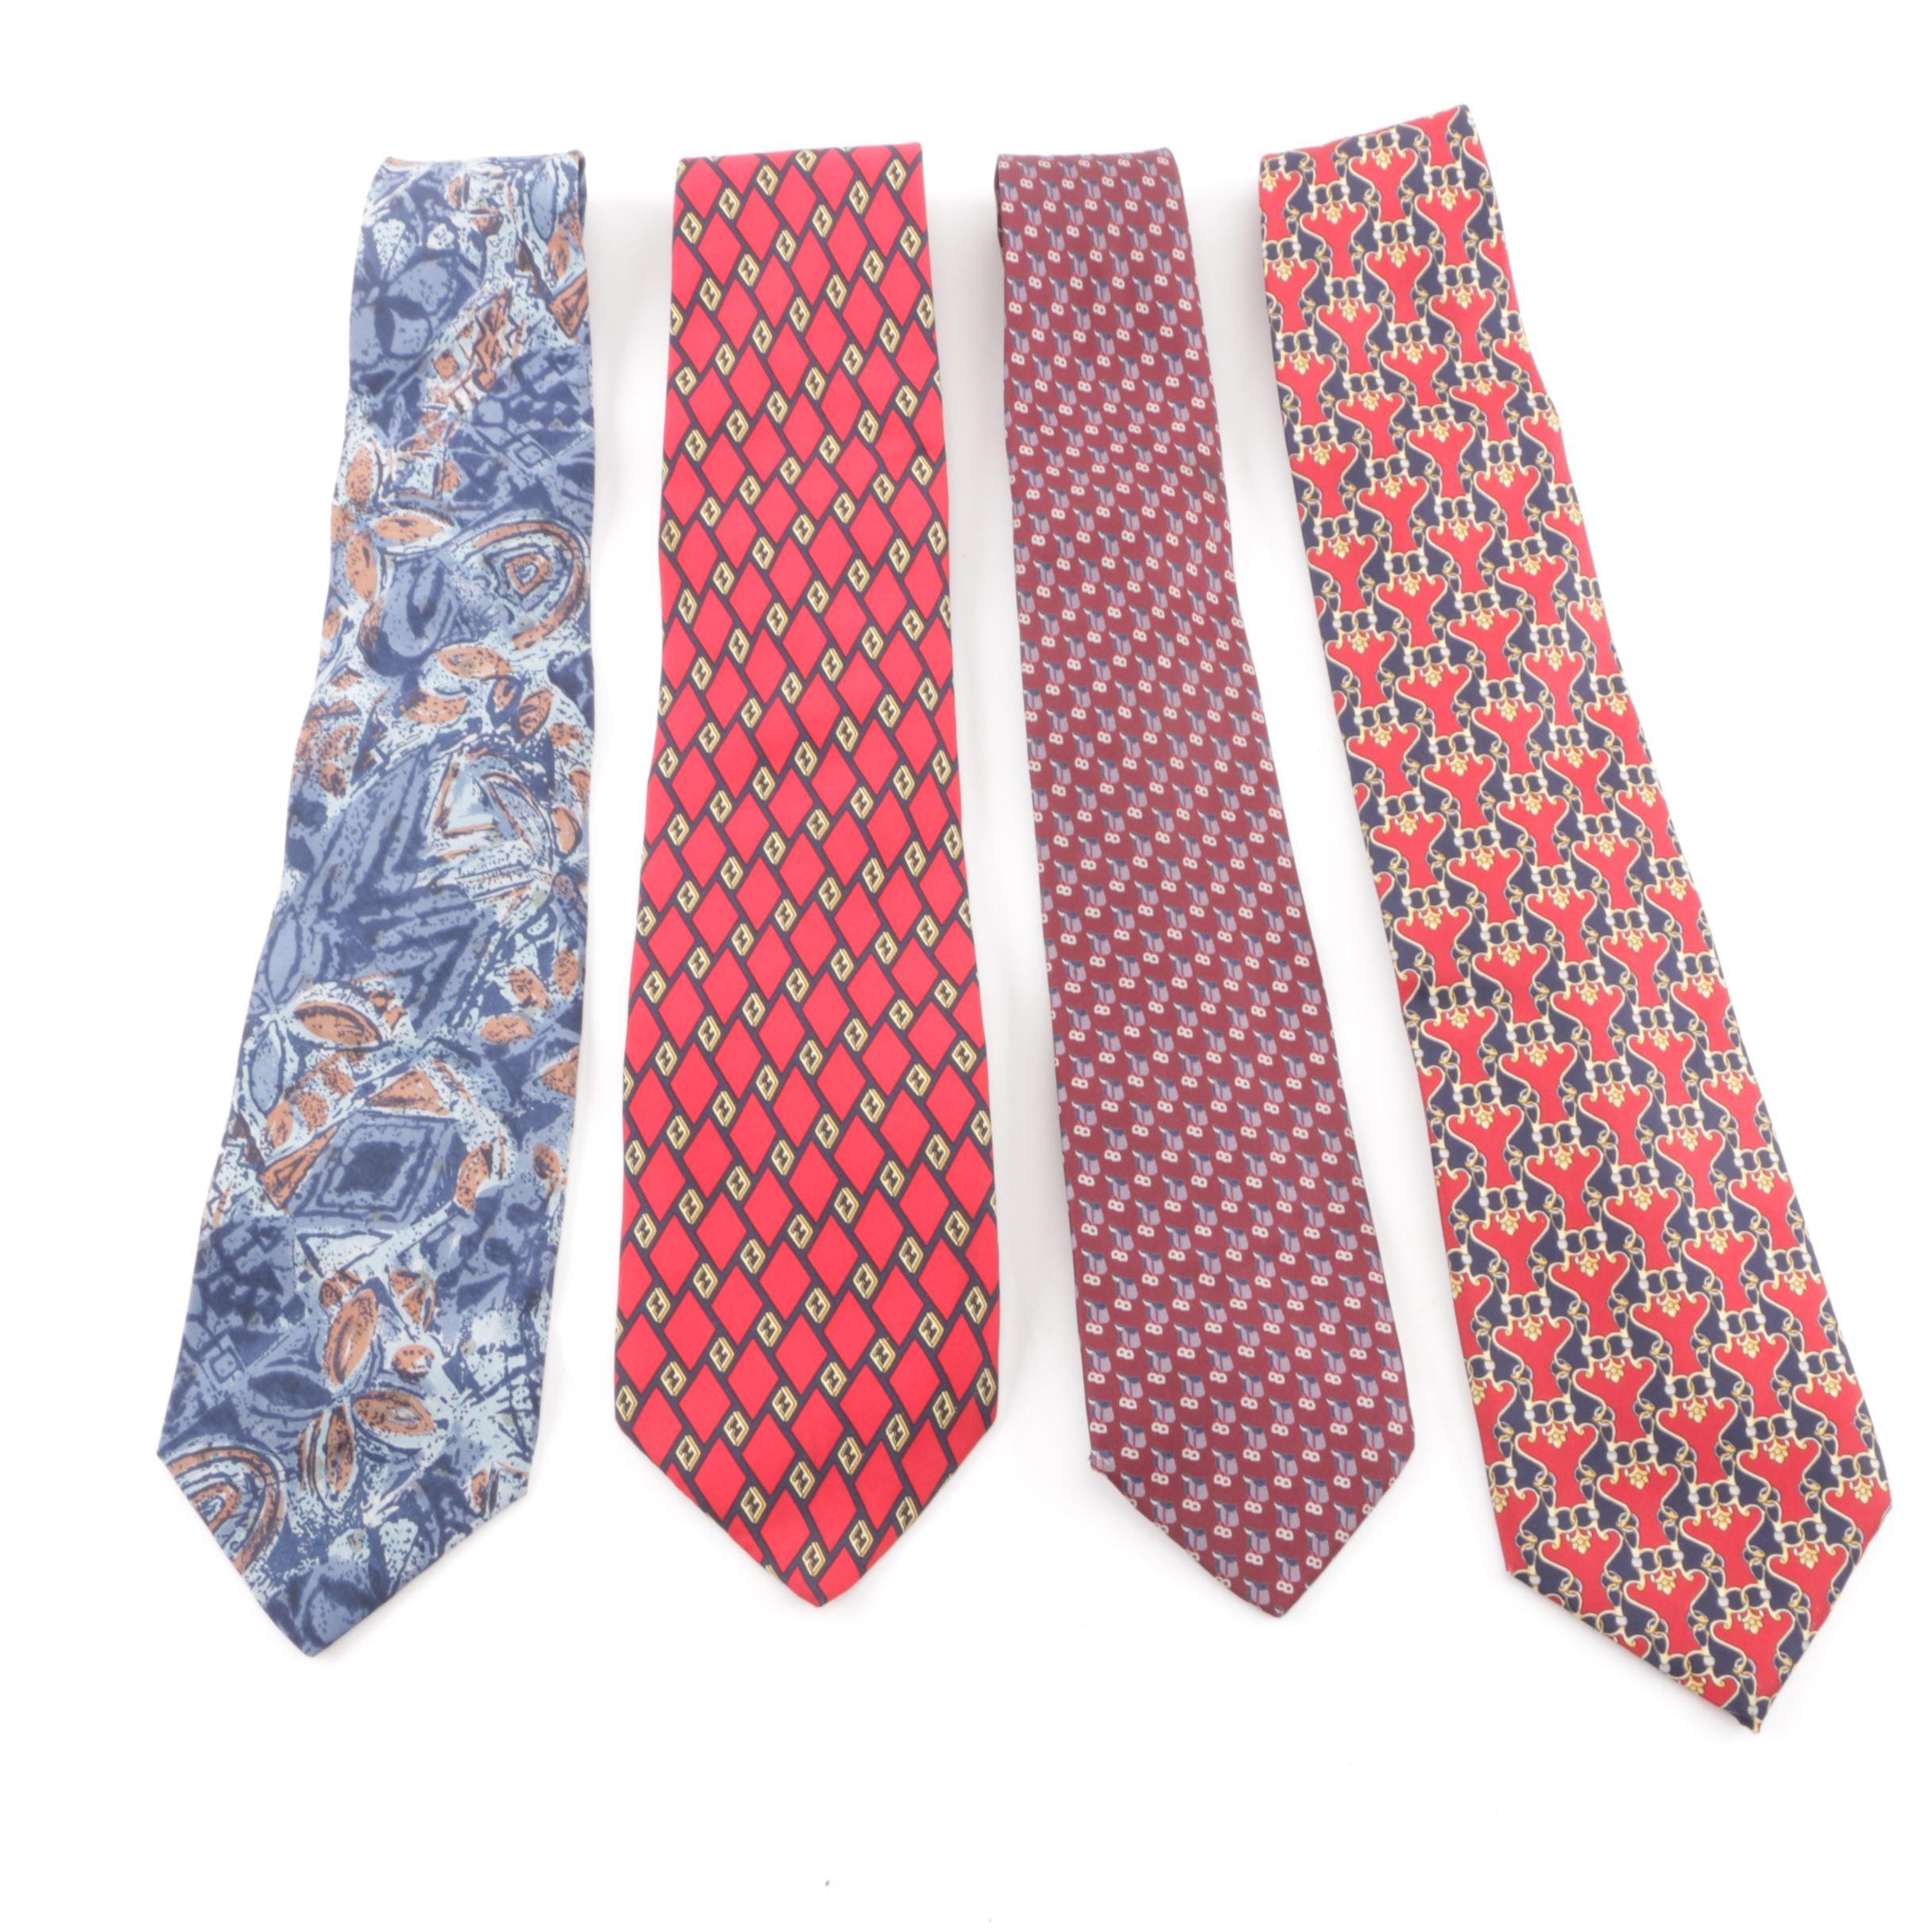 Men's Gucci and Fendi Silk Neckties